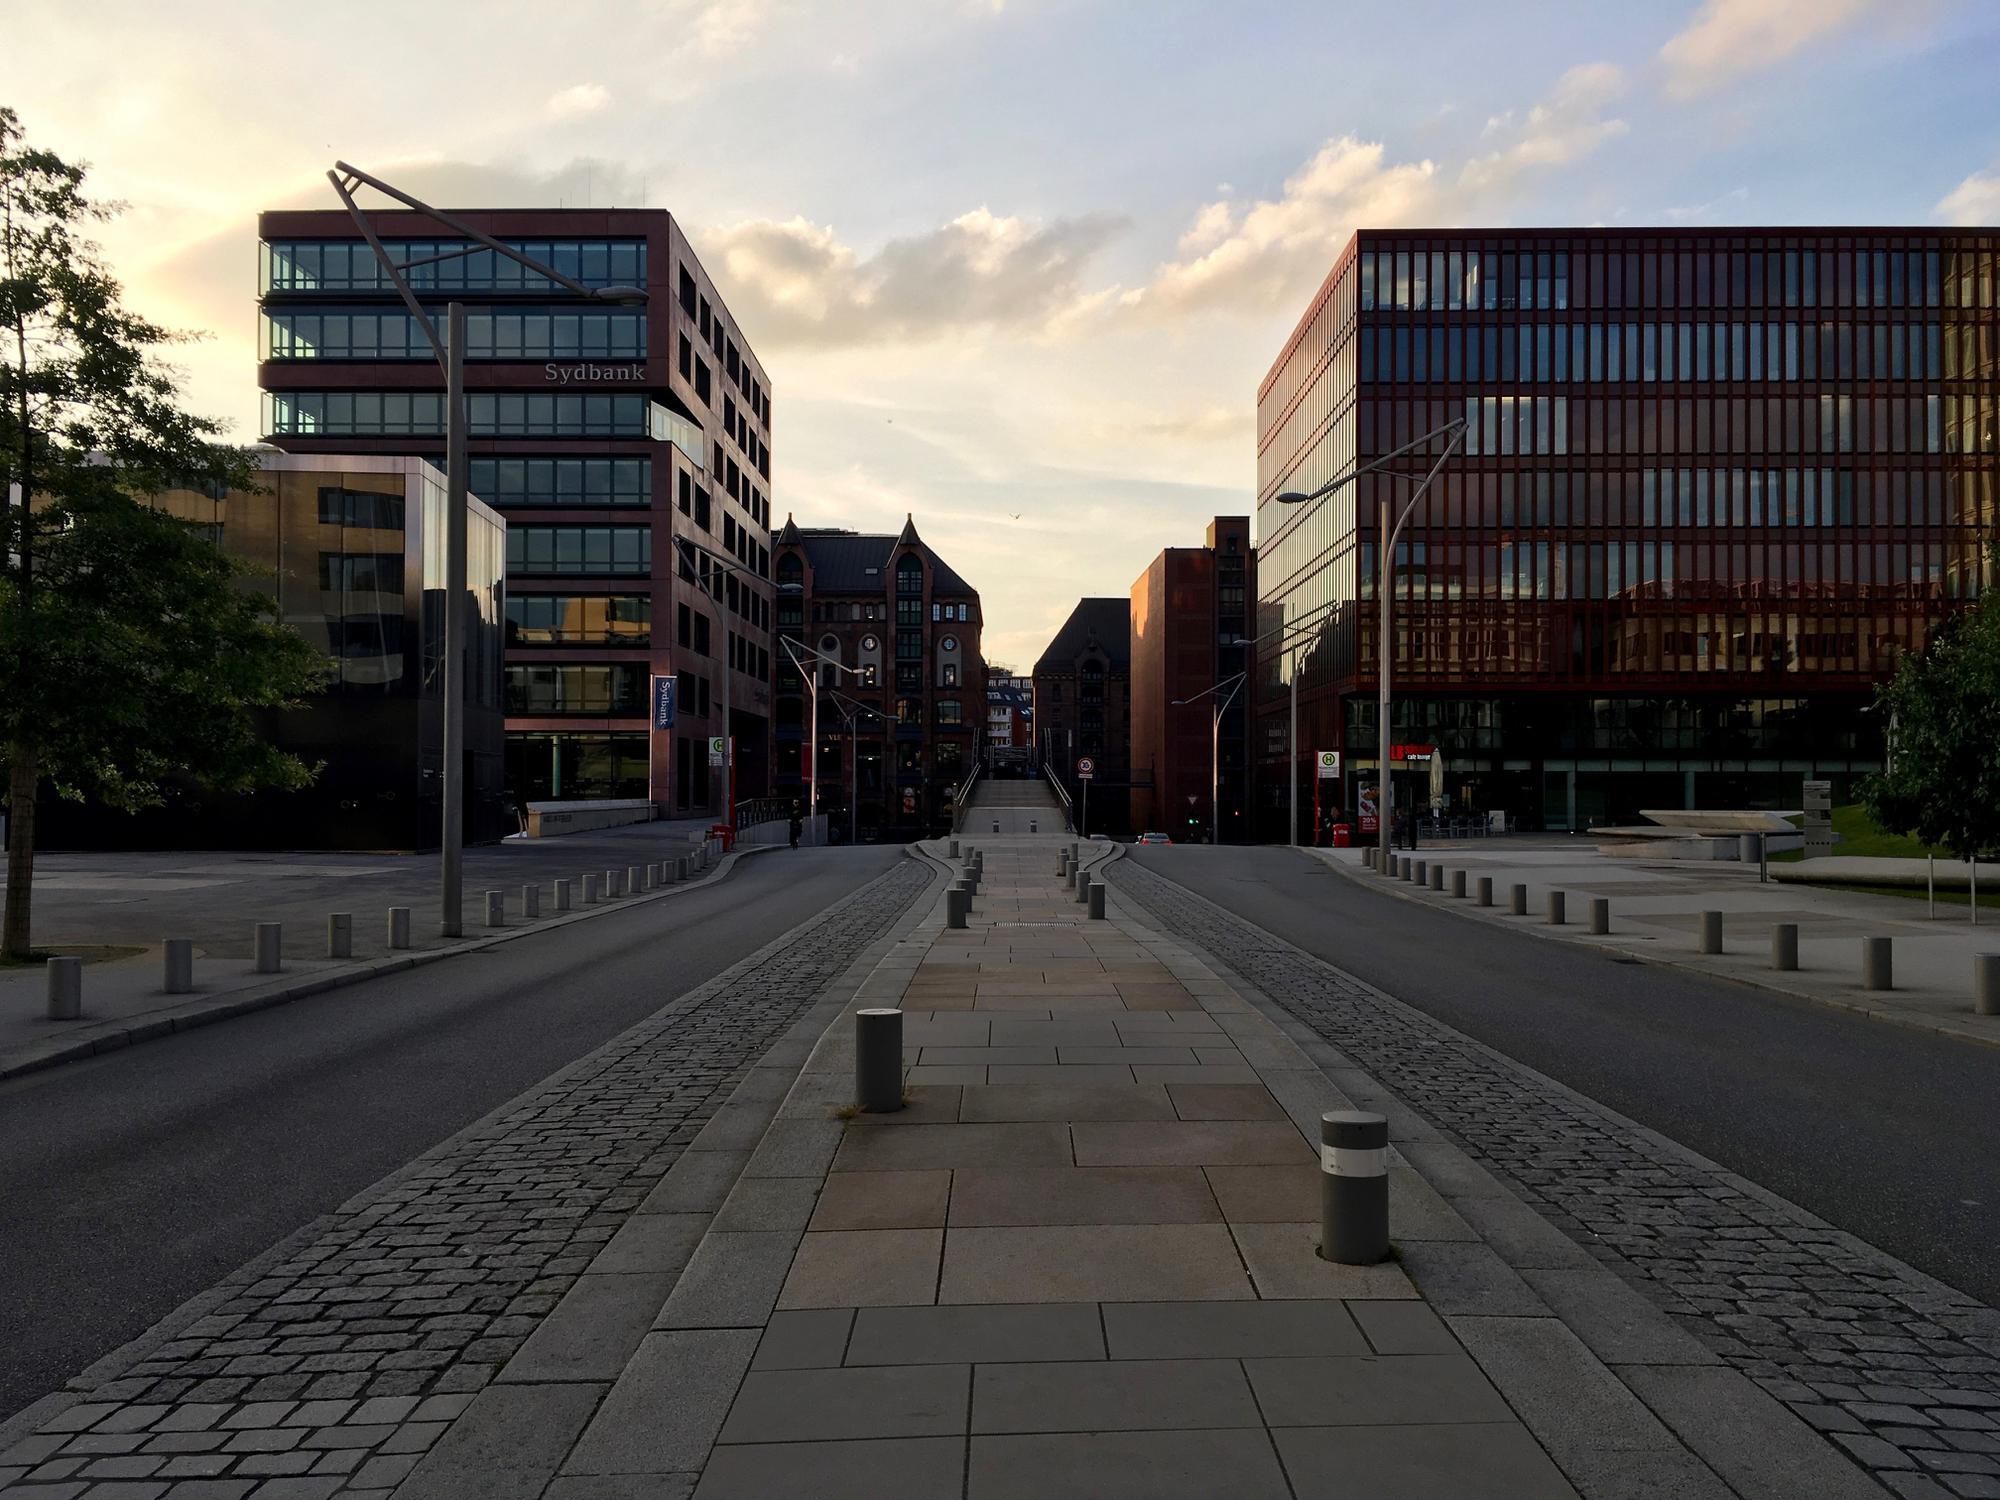 🇩🇪 Hamburg, Germany, july 2016.